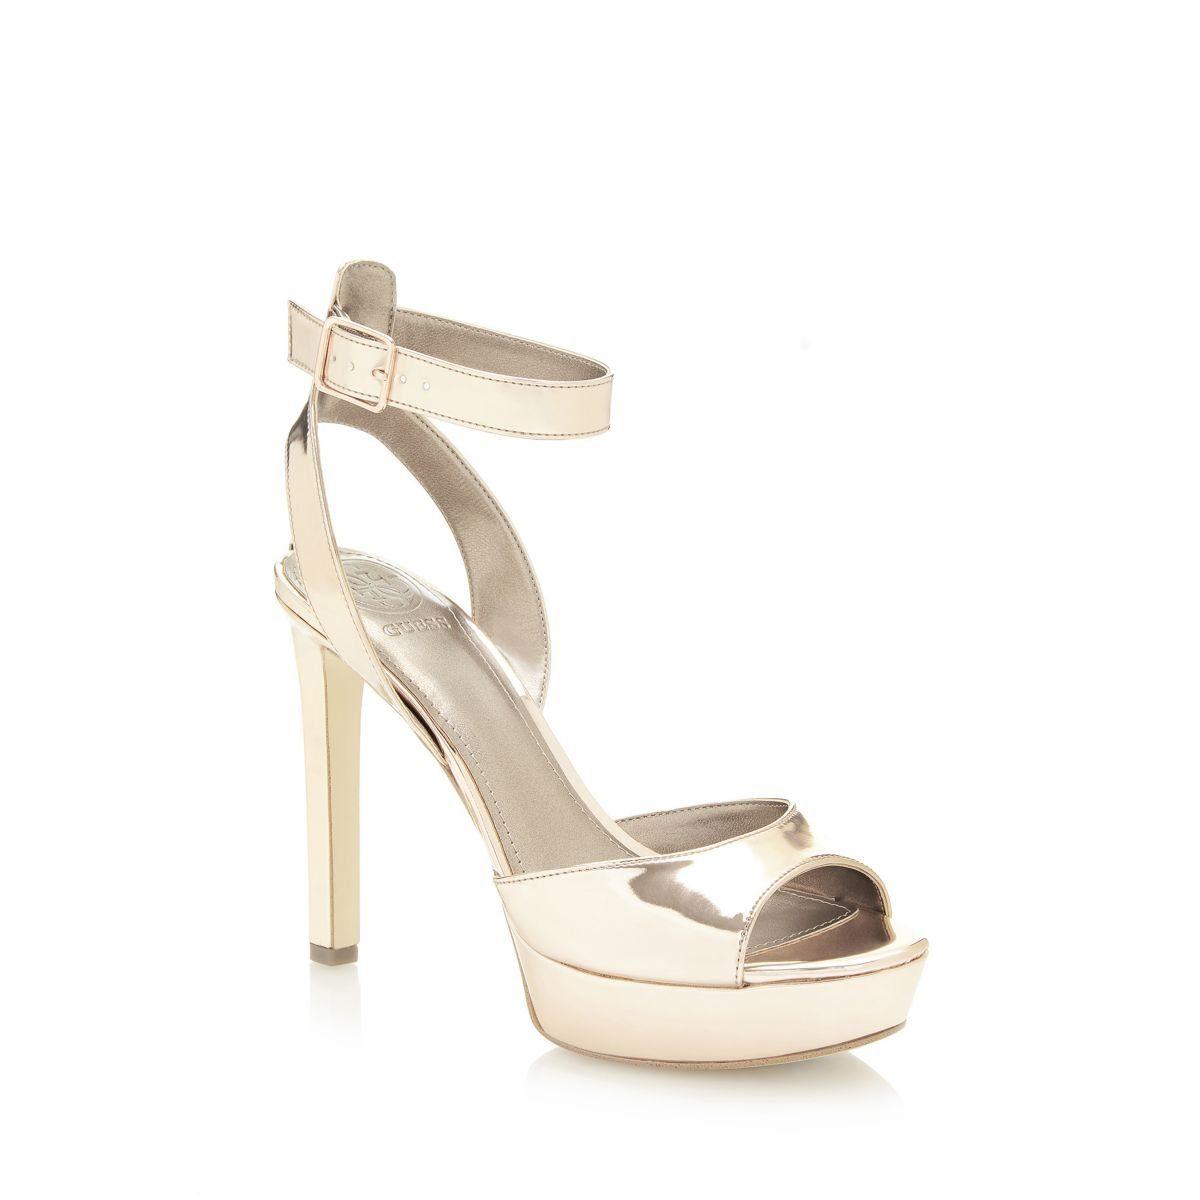 Guess Sandale online kaufen  goldfarben